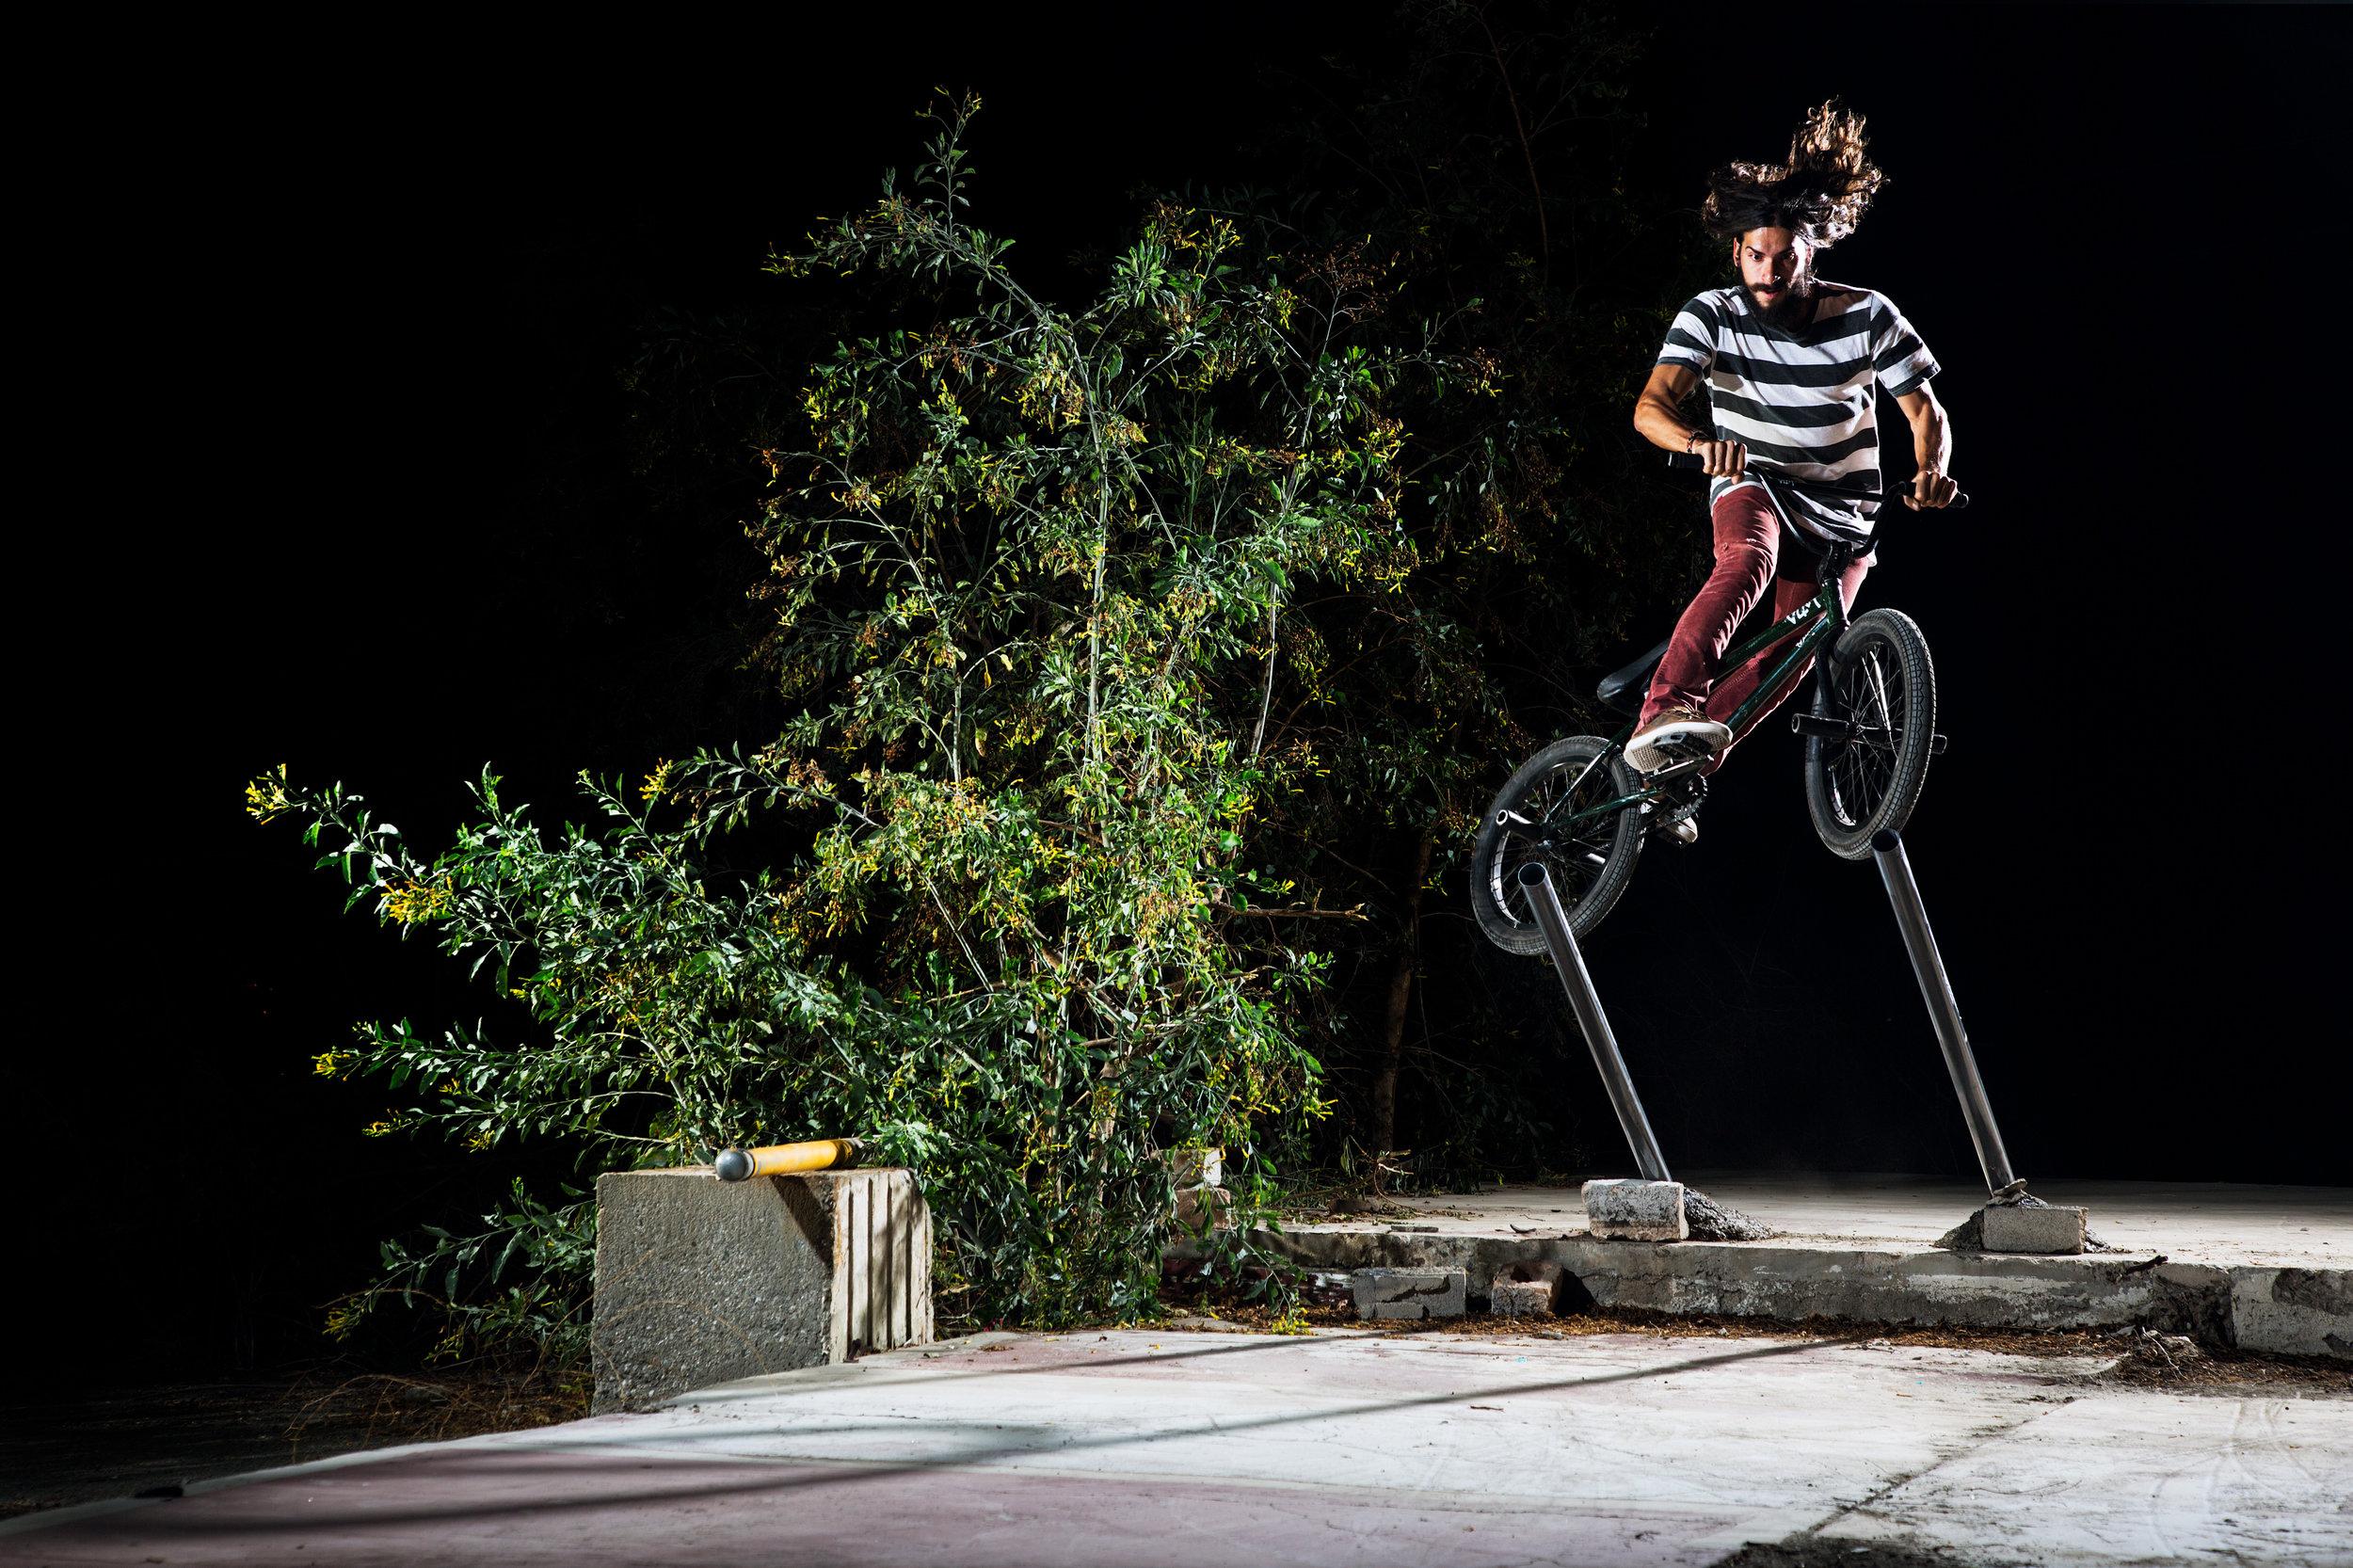 Mike-Mastroni-BMX-Tireslide-Pole-Jam-Devin-Feil.jpg